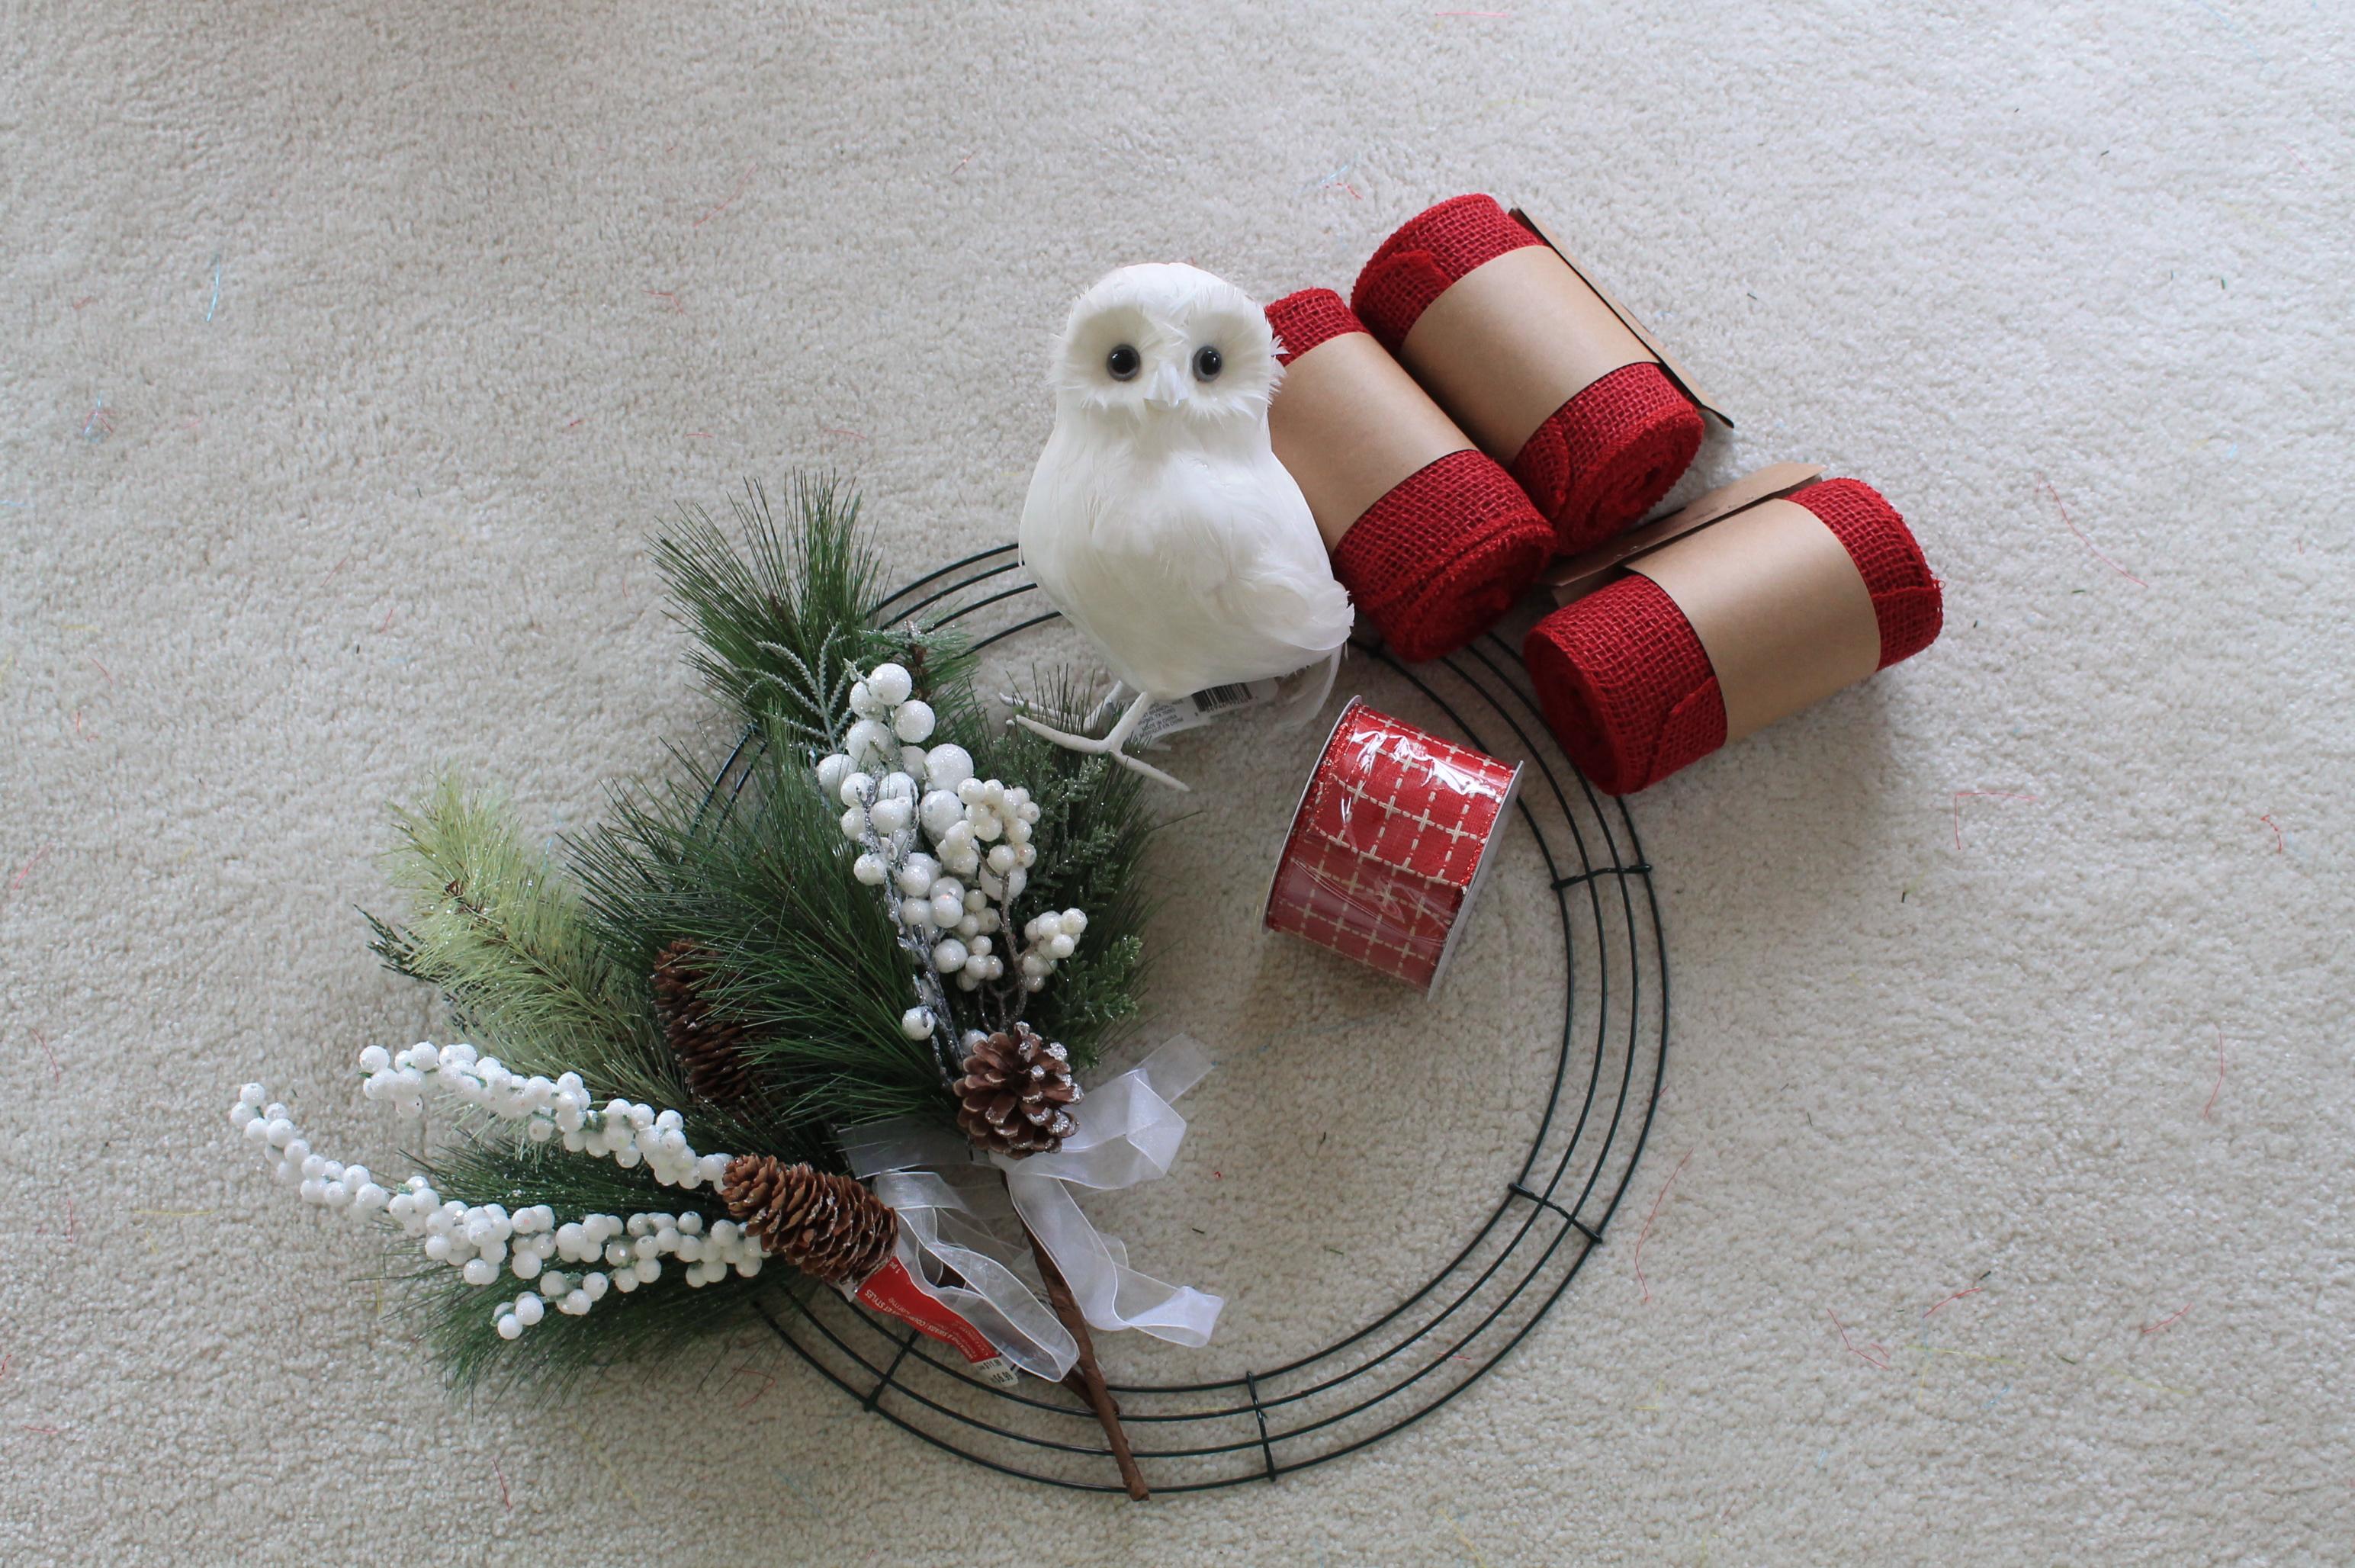 DIY Burlap Snow Owl Wreath The Wreath Depot